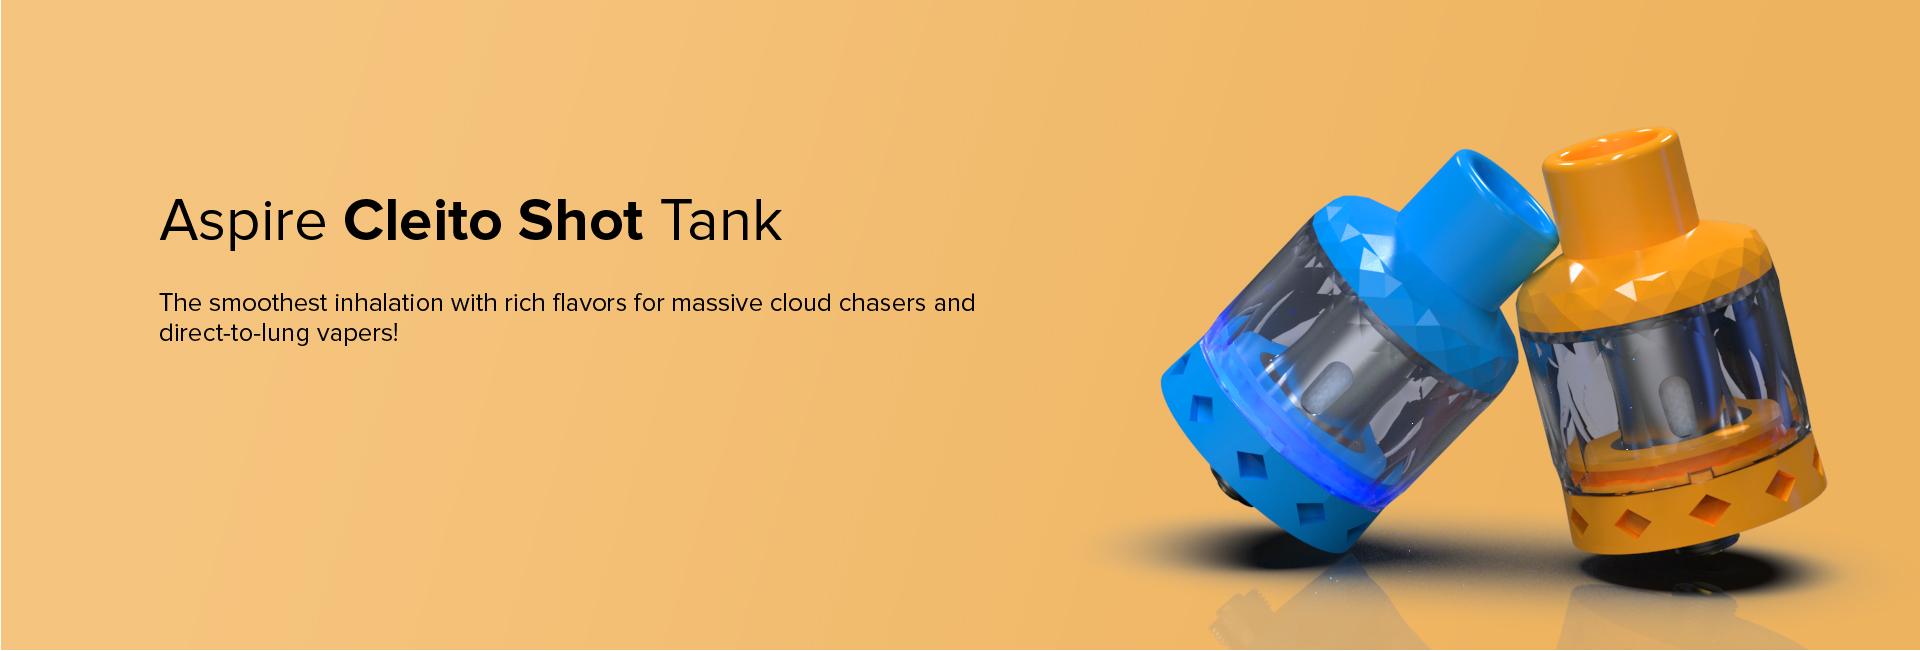 Cleito Shot Tank aspire vapexperts 1